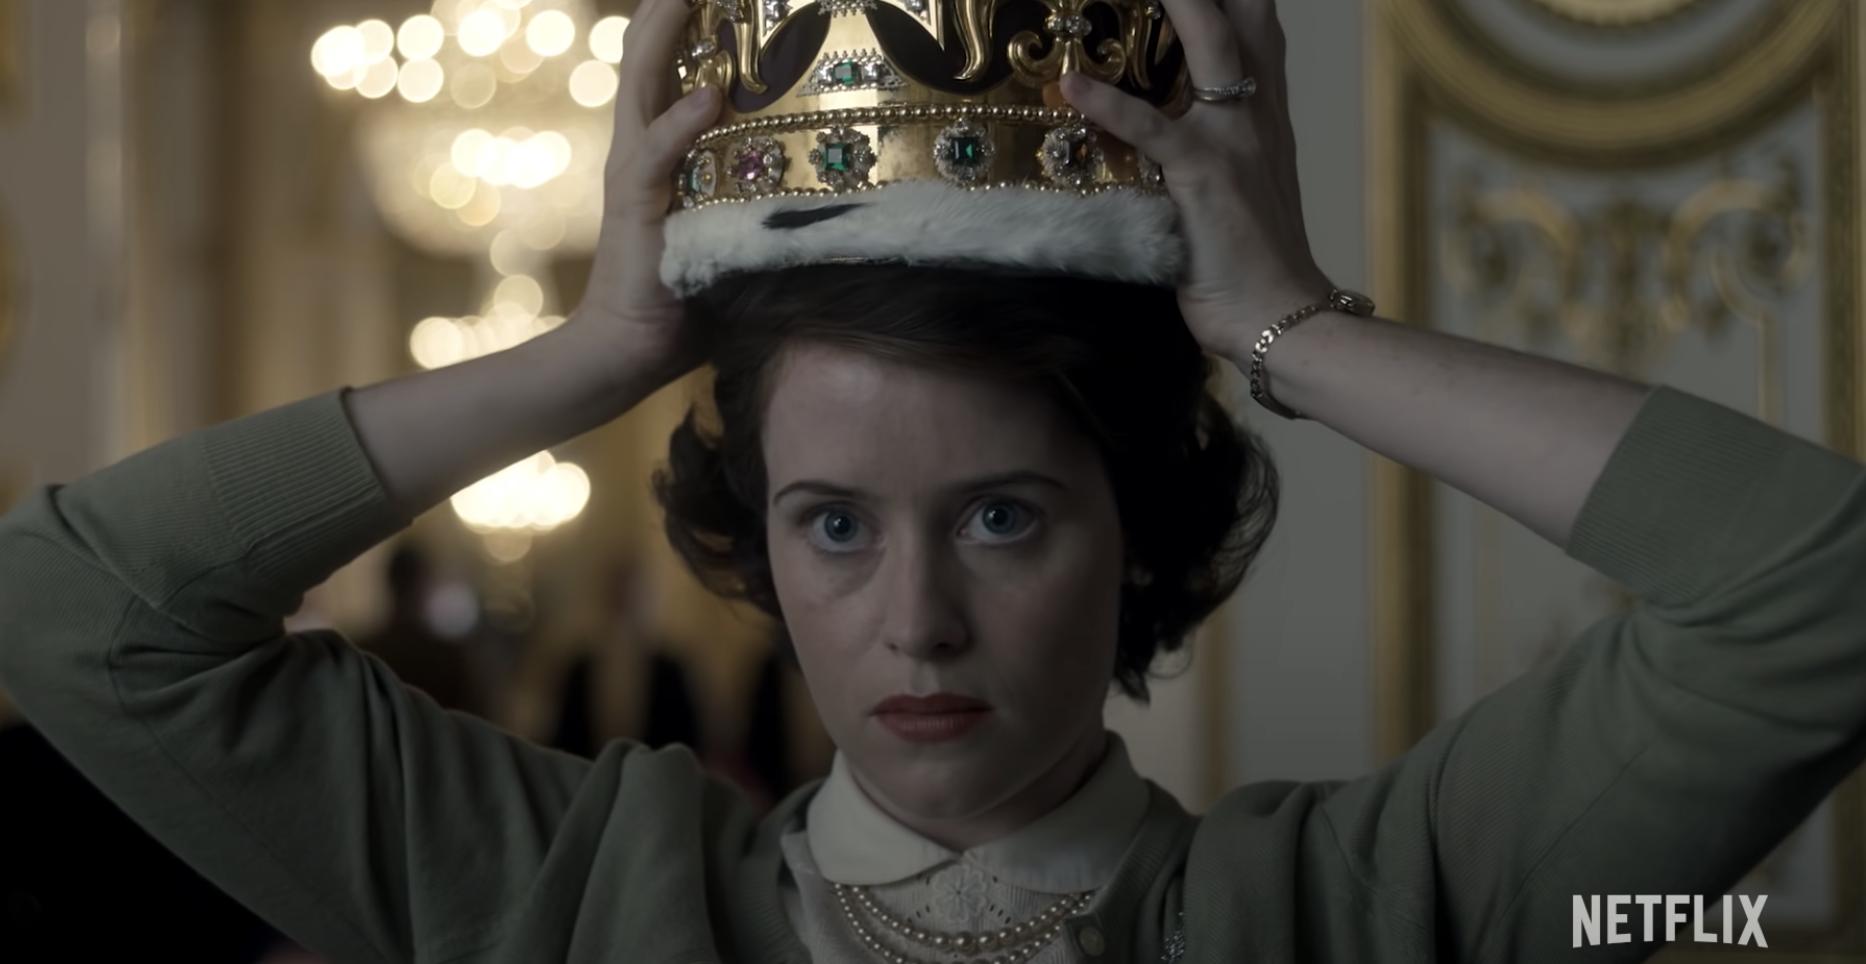 The Queen wearing her crown in the Netflix series